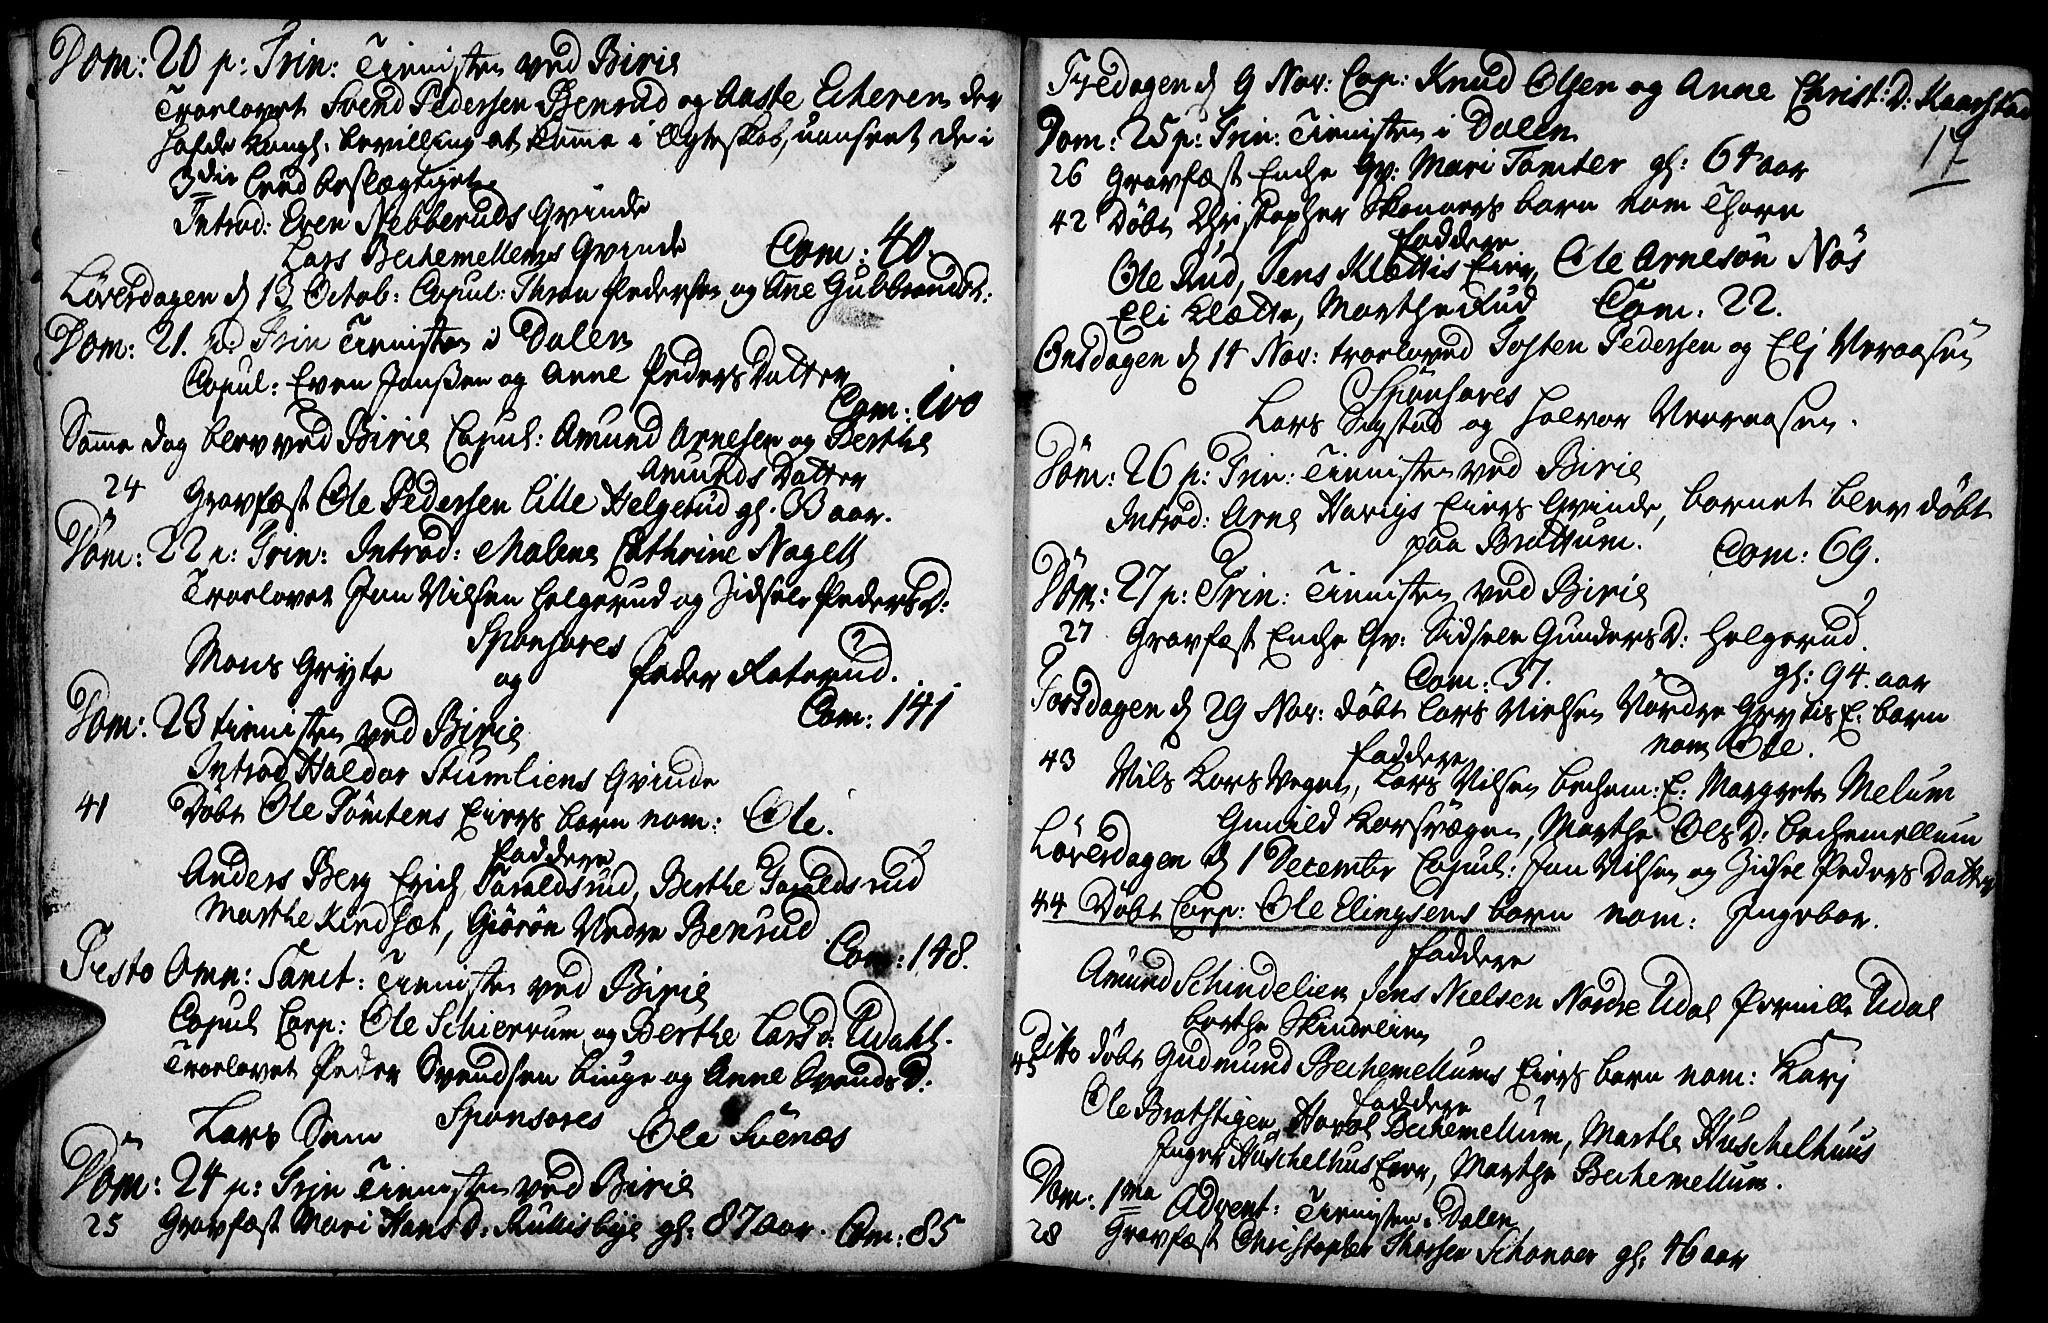 SAH, Biri prestekontor, Parish register (official) no. 1, 1730-1754, p. 17